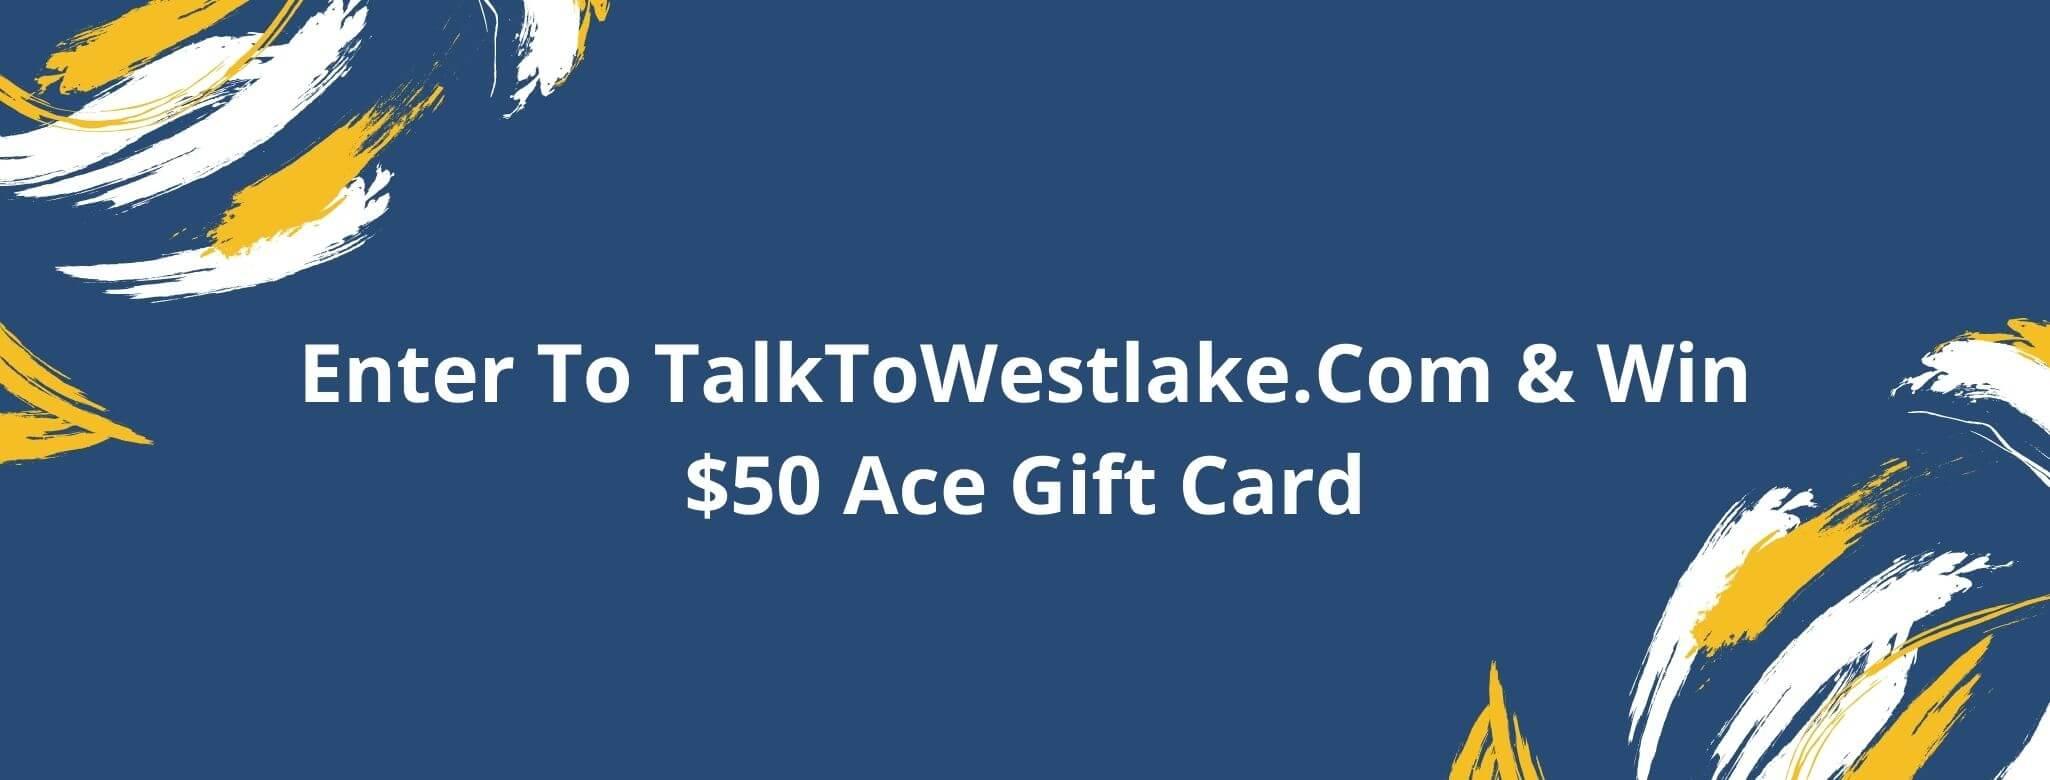 talktowestlake survey